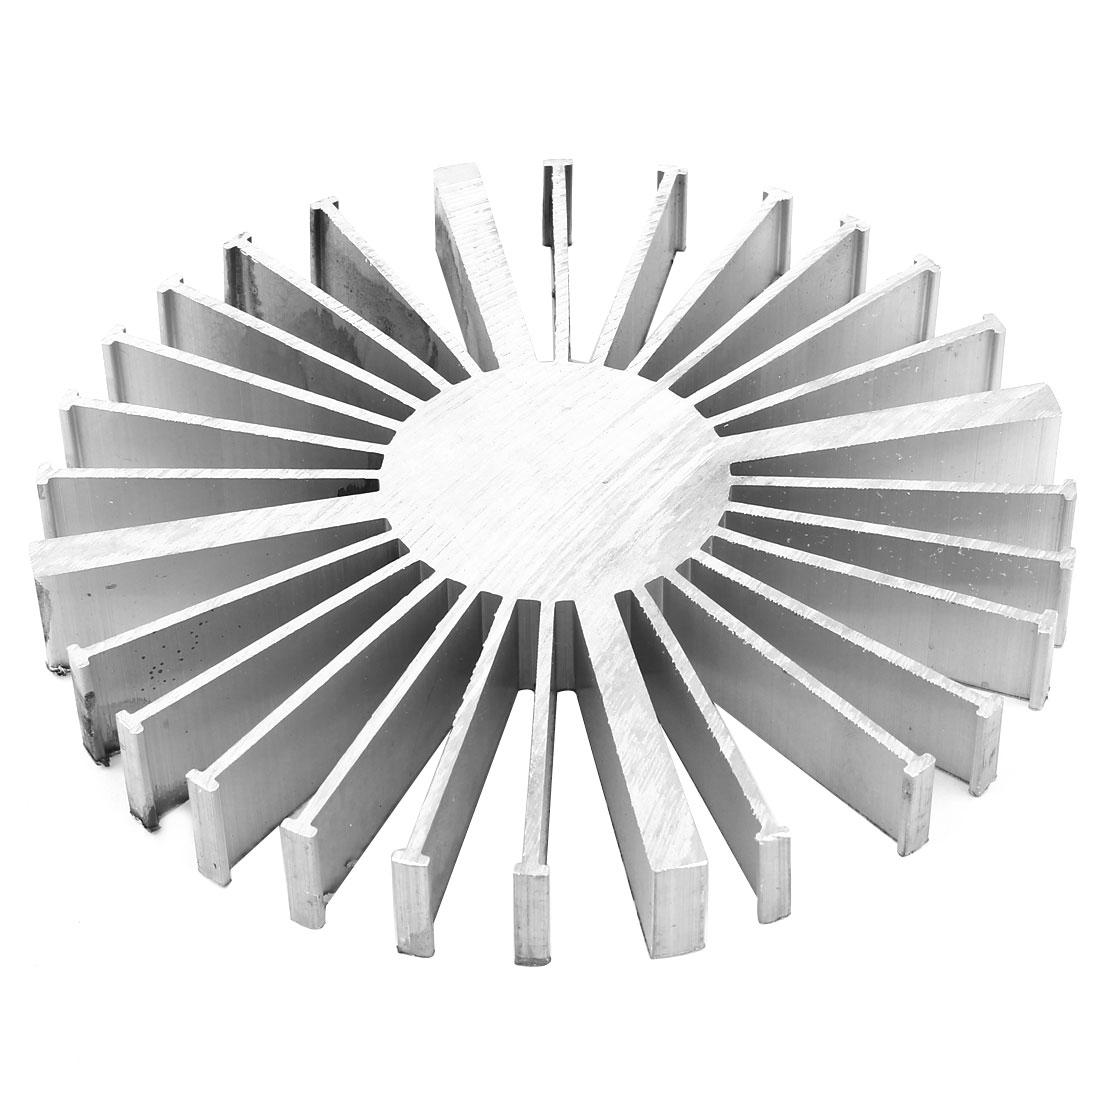 160mm x 20mm Cylinder 7x3W 20x1W LED Heatsink Aluminium Cooling Fin